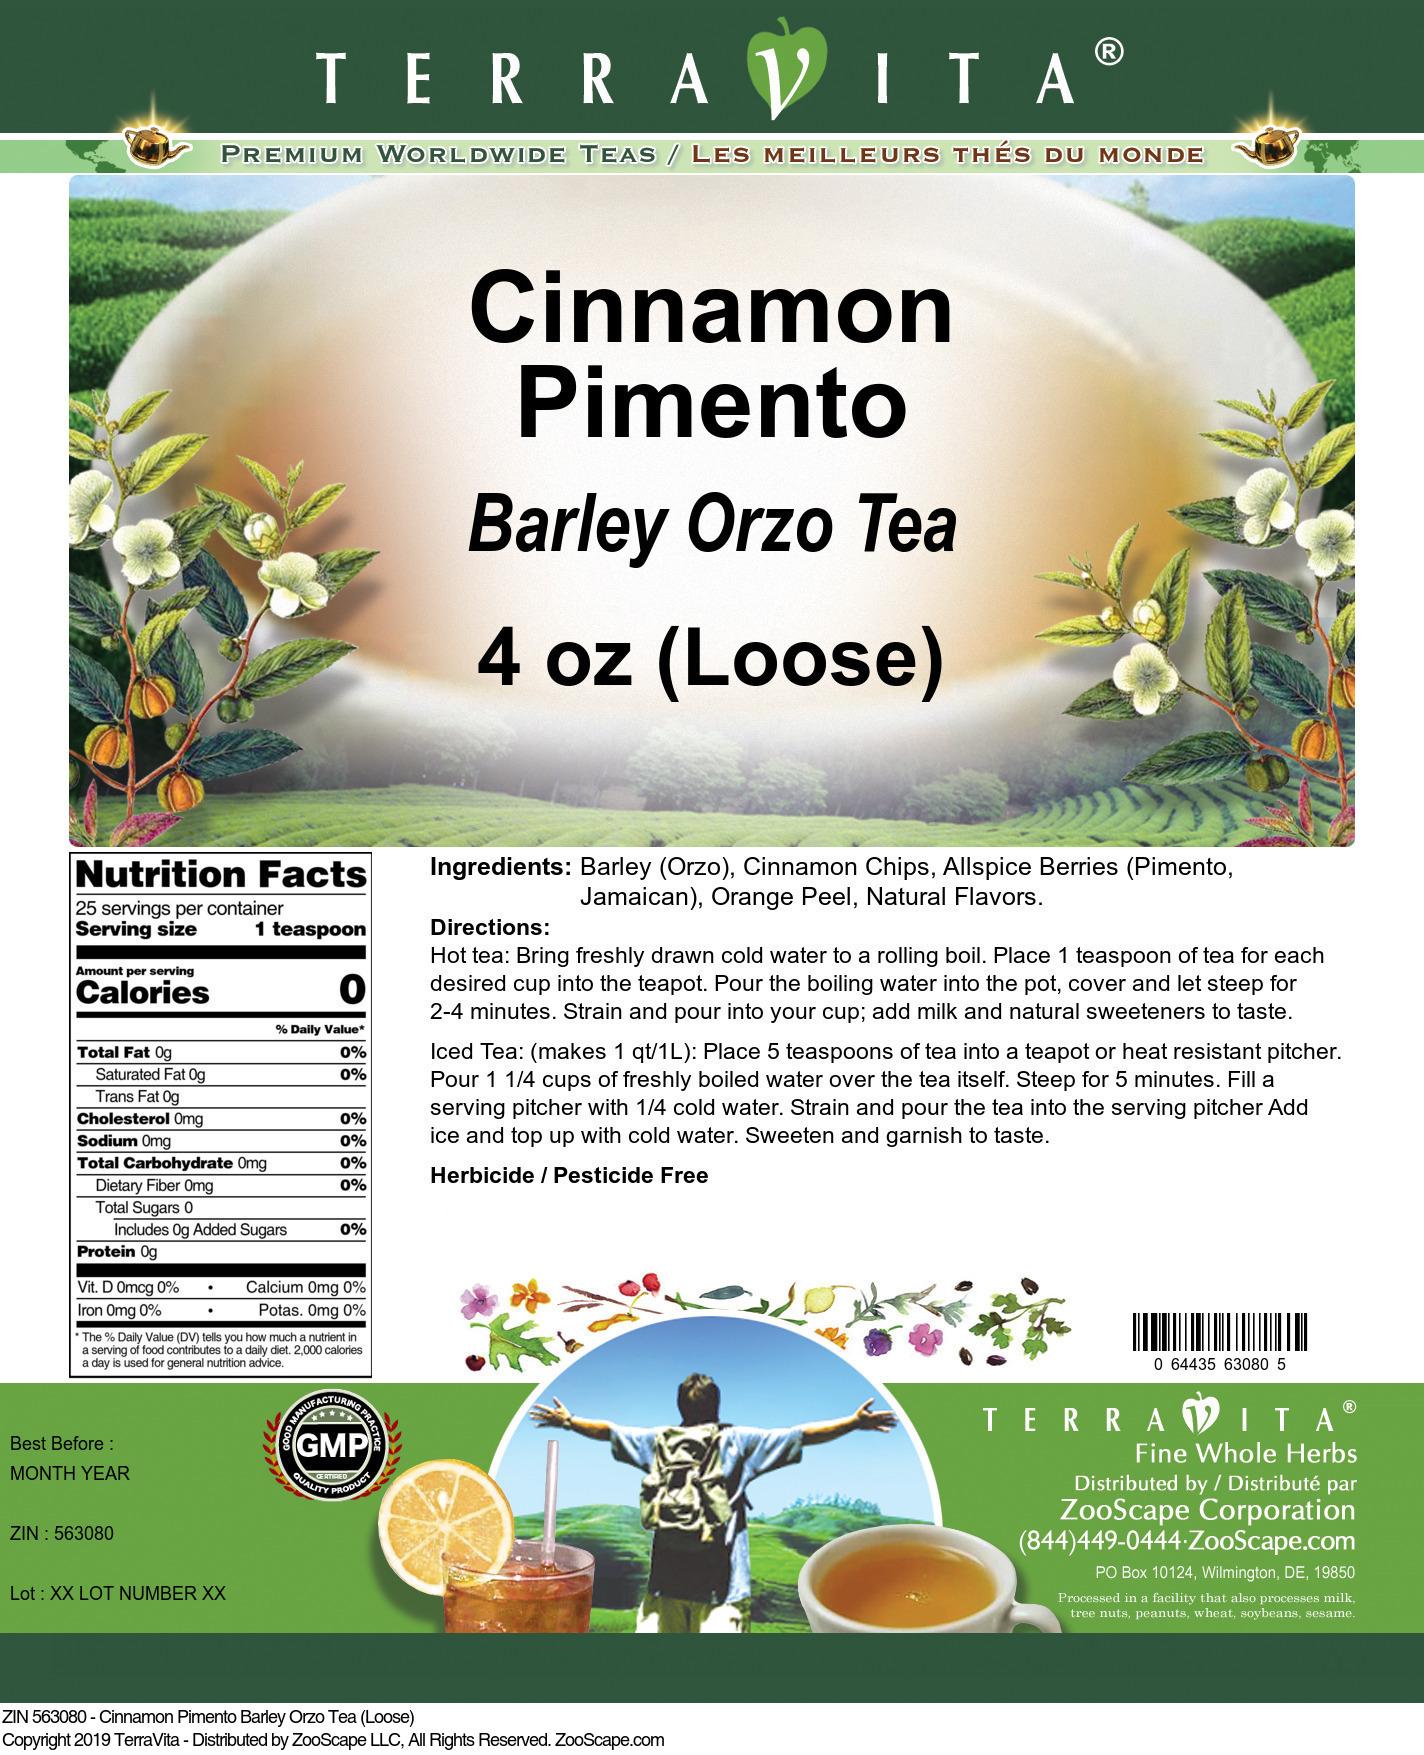 Cinnamon Pimento Barley Orzo